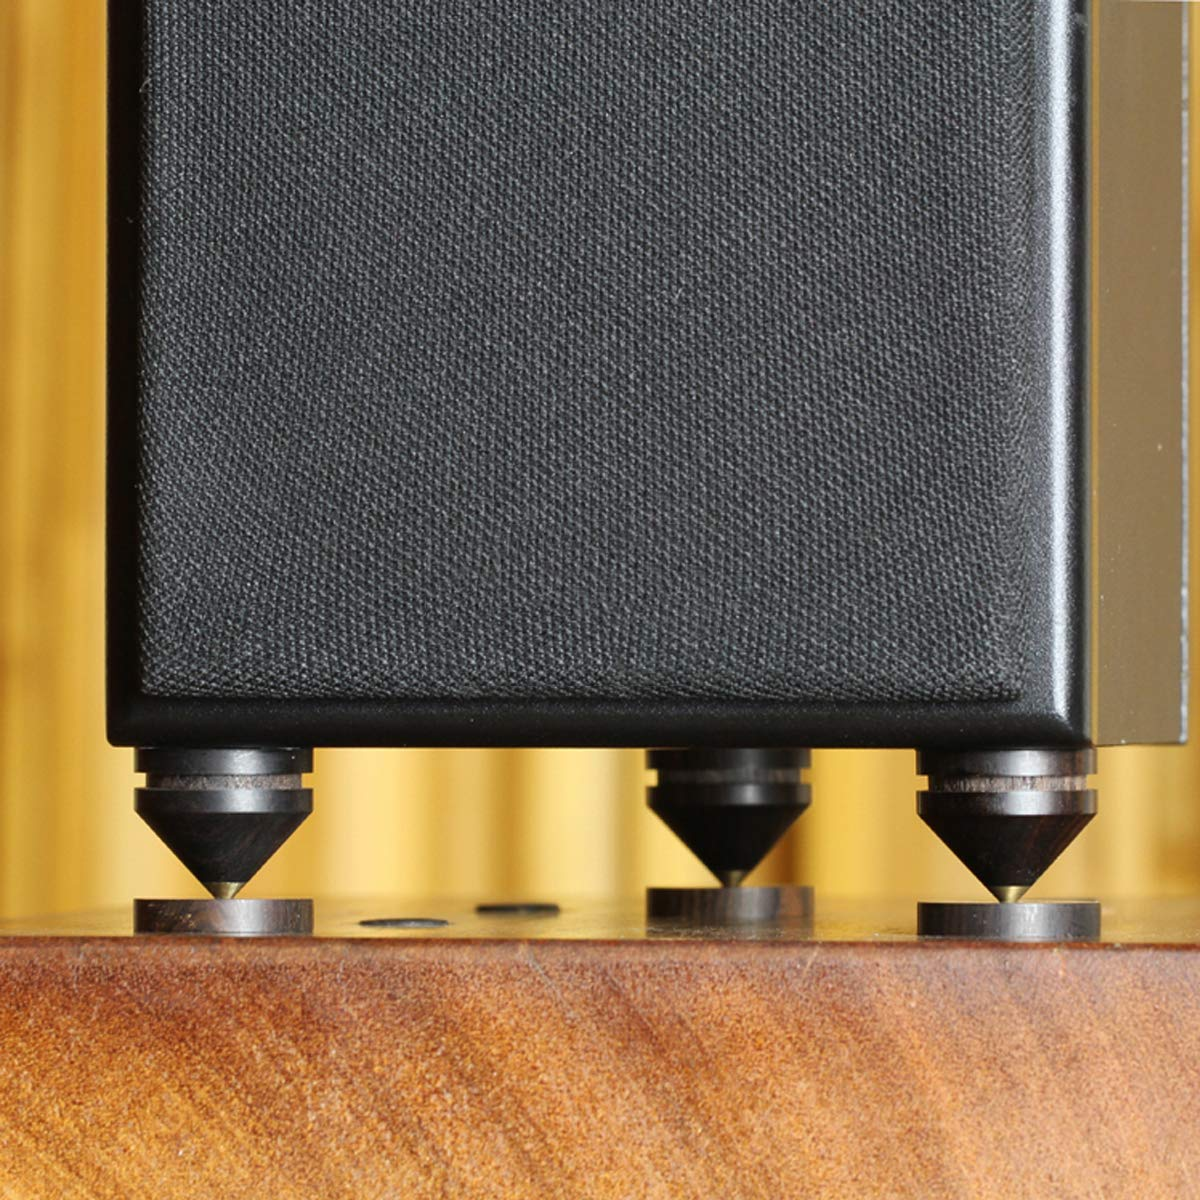 QIZIANG QIZIANG QIZIANG 4Pcs Ebenholz Lautsprecher Spike Isolation stehen Holz Kupfer Spitze Füße Spike mit 23mm Basis Pad Hot B07NWT9LBY   Up-to-date-styling  ea83ea